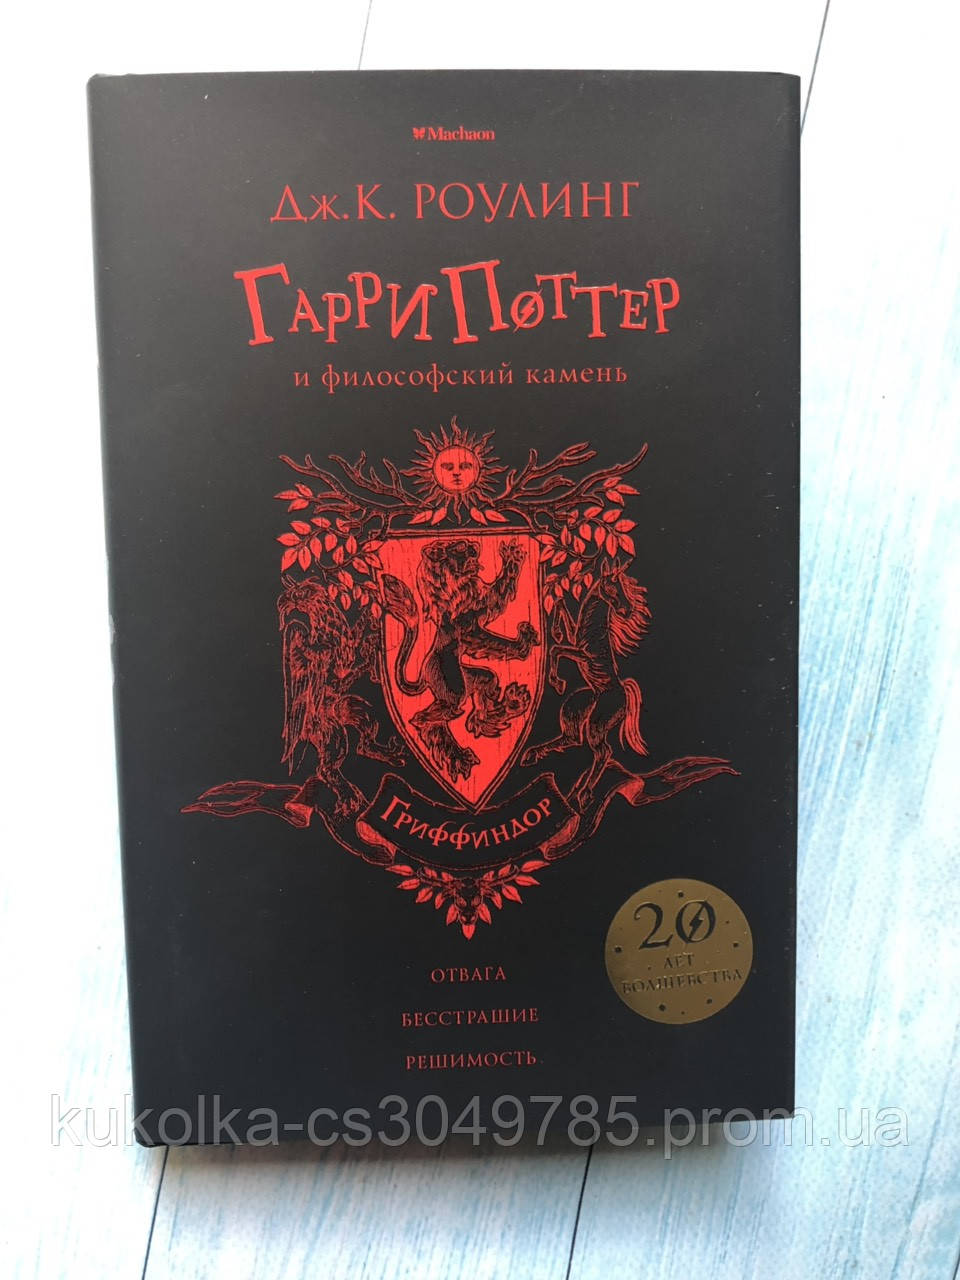 Книга Джоан Роулинг Гарри Поттер и философский камень Гриффиндор арт.9785389136212